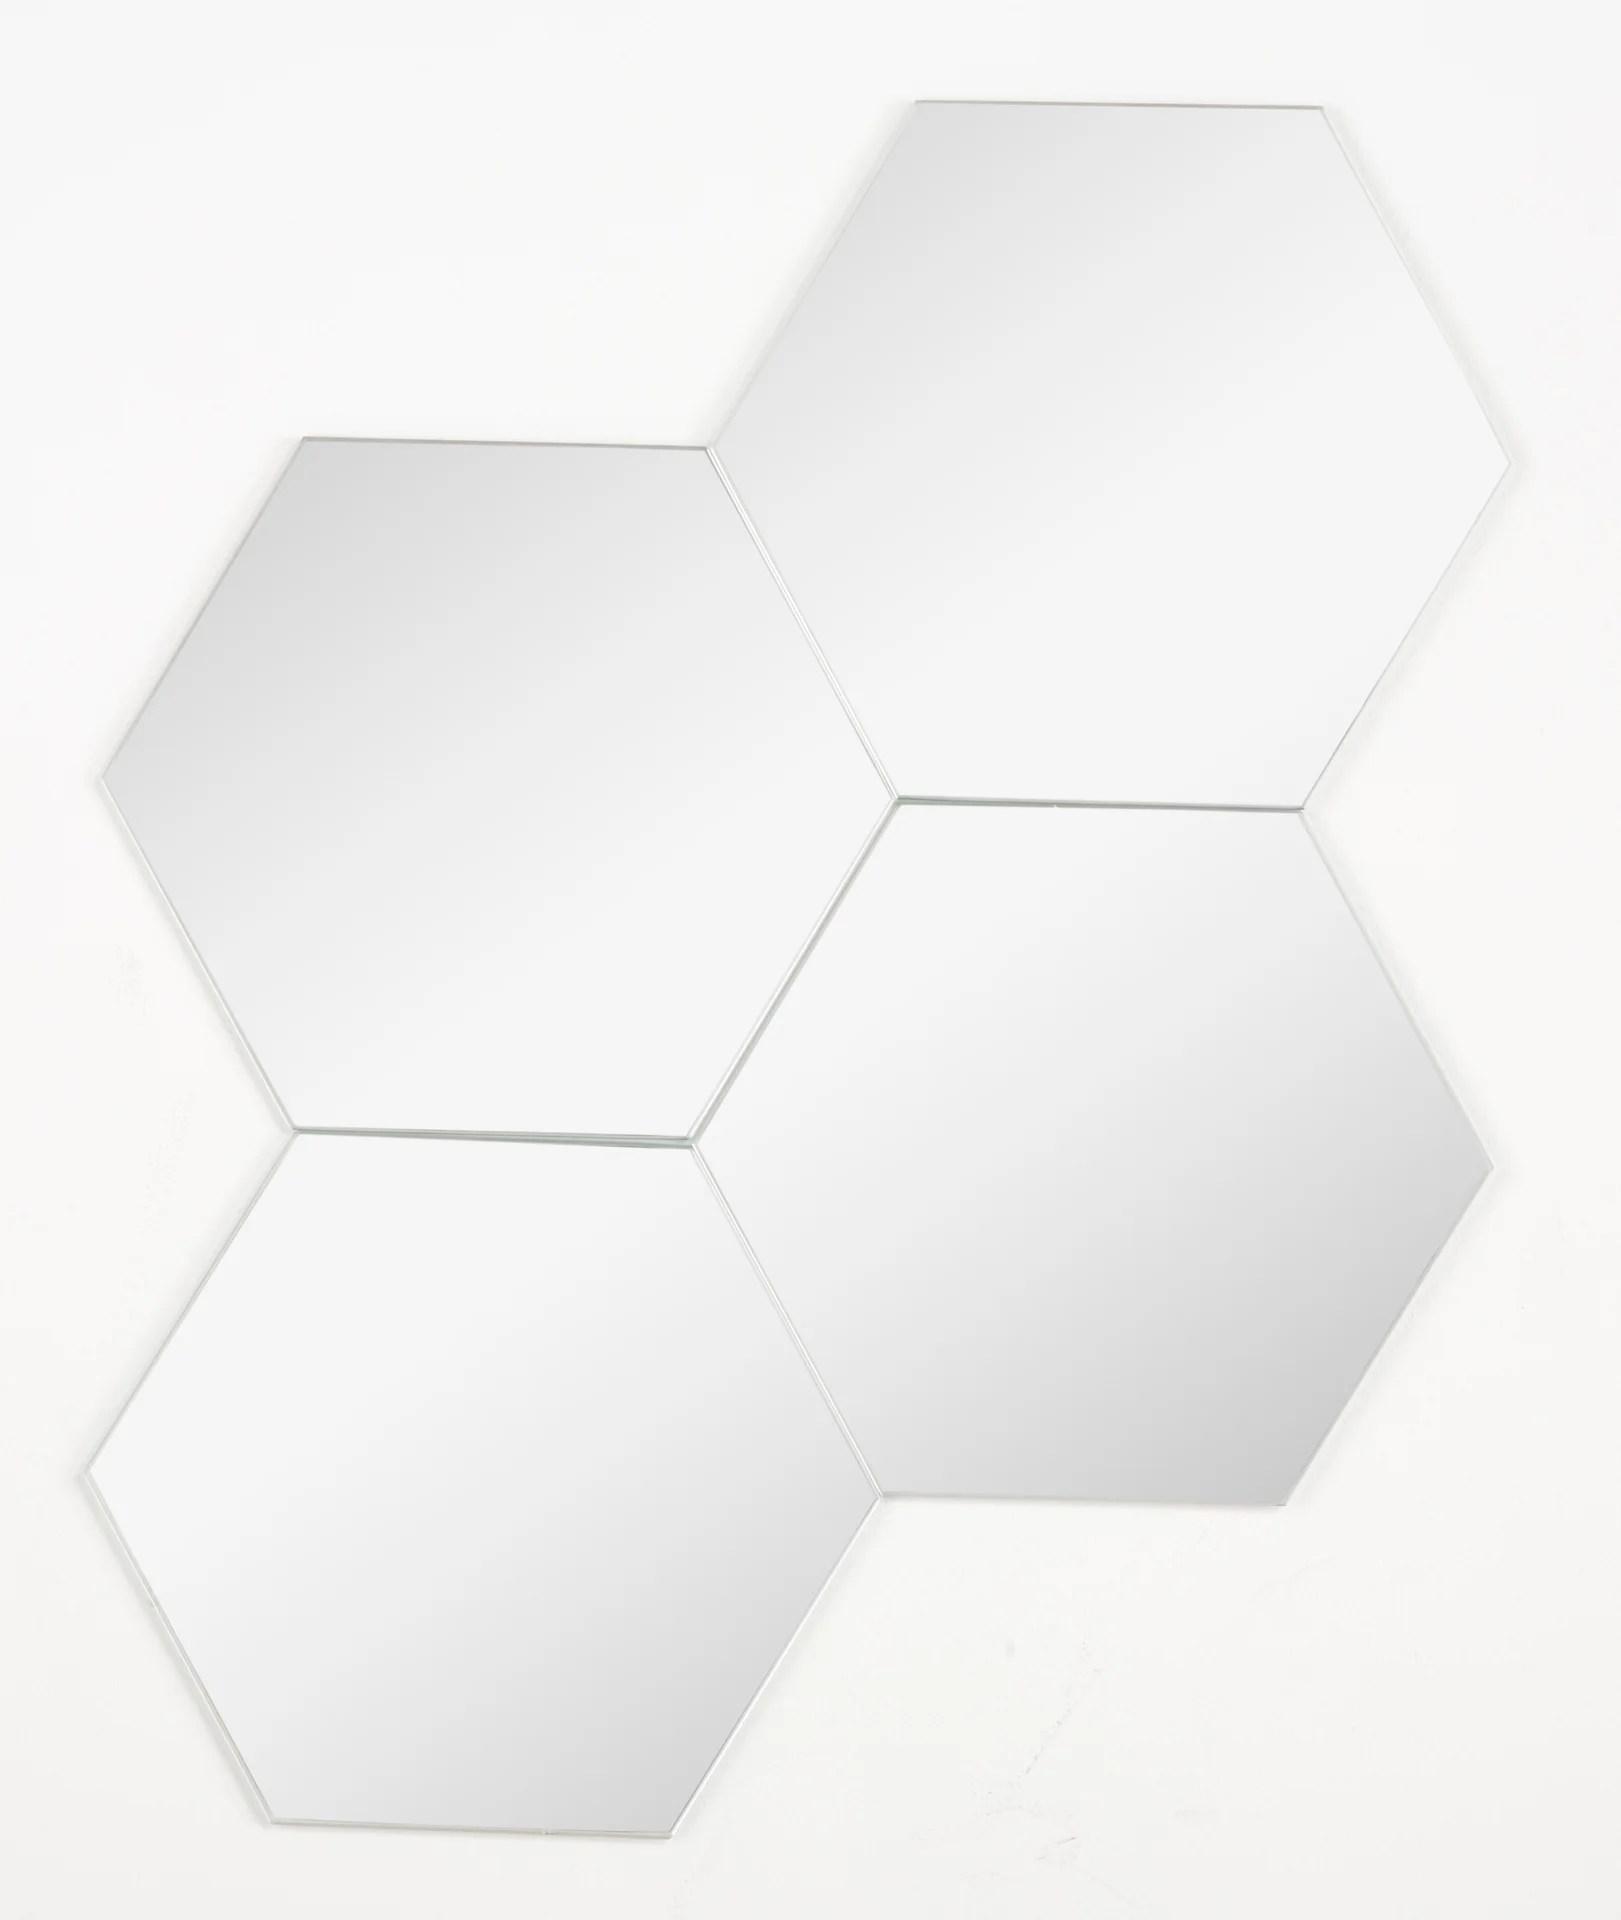 Lot De 4 Miroirs Non Lumineux Adhesifs Hexagonaux L 15 X L 15 Cm Leroy Merlin